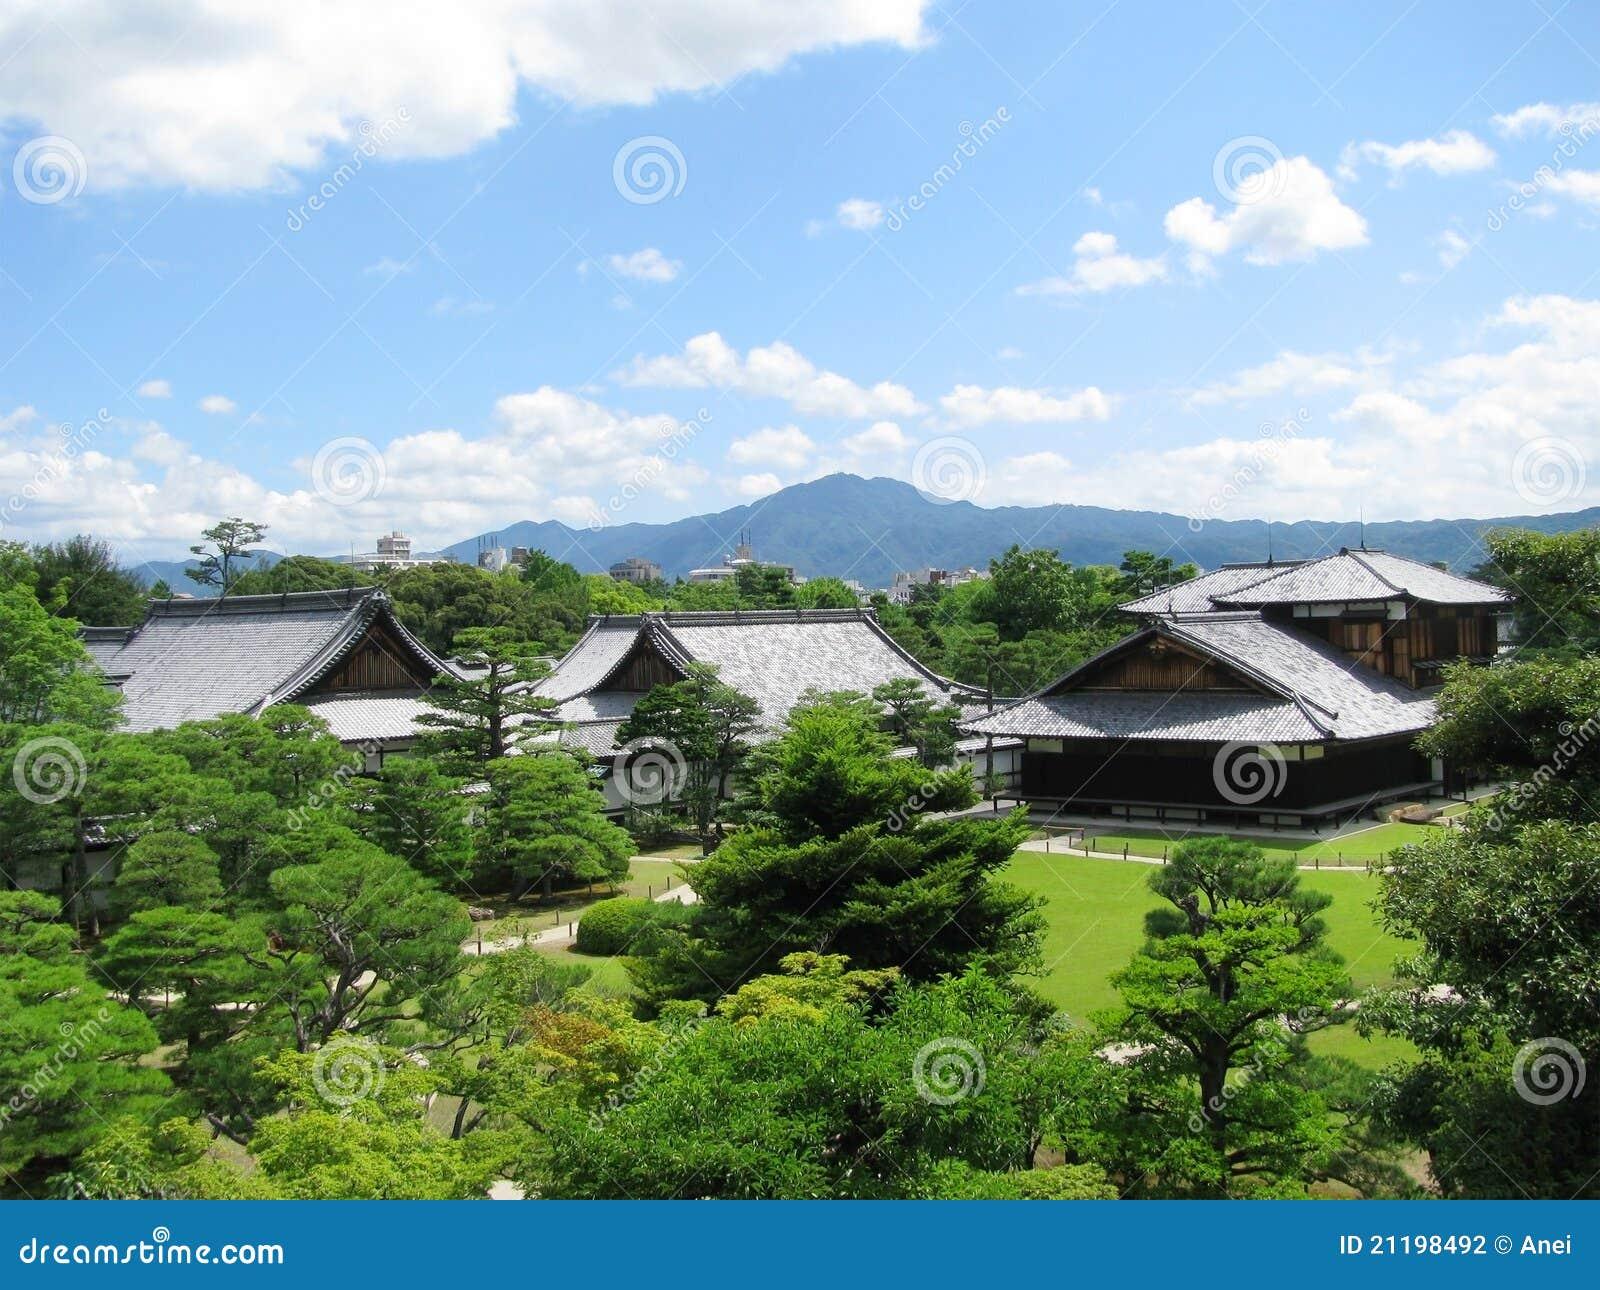 Kyoto Nijo castle gardens